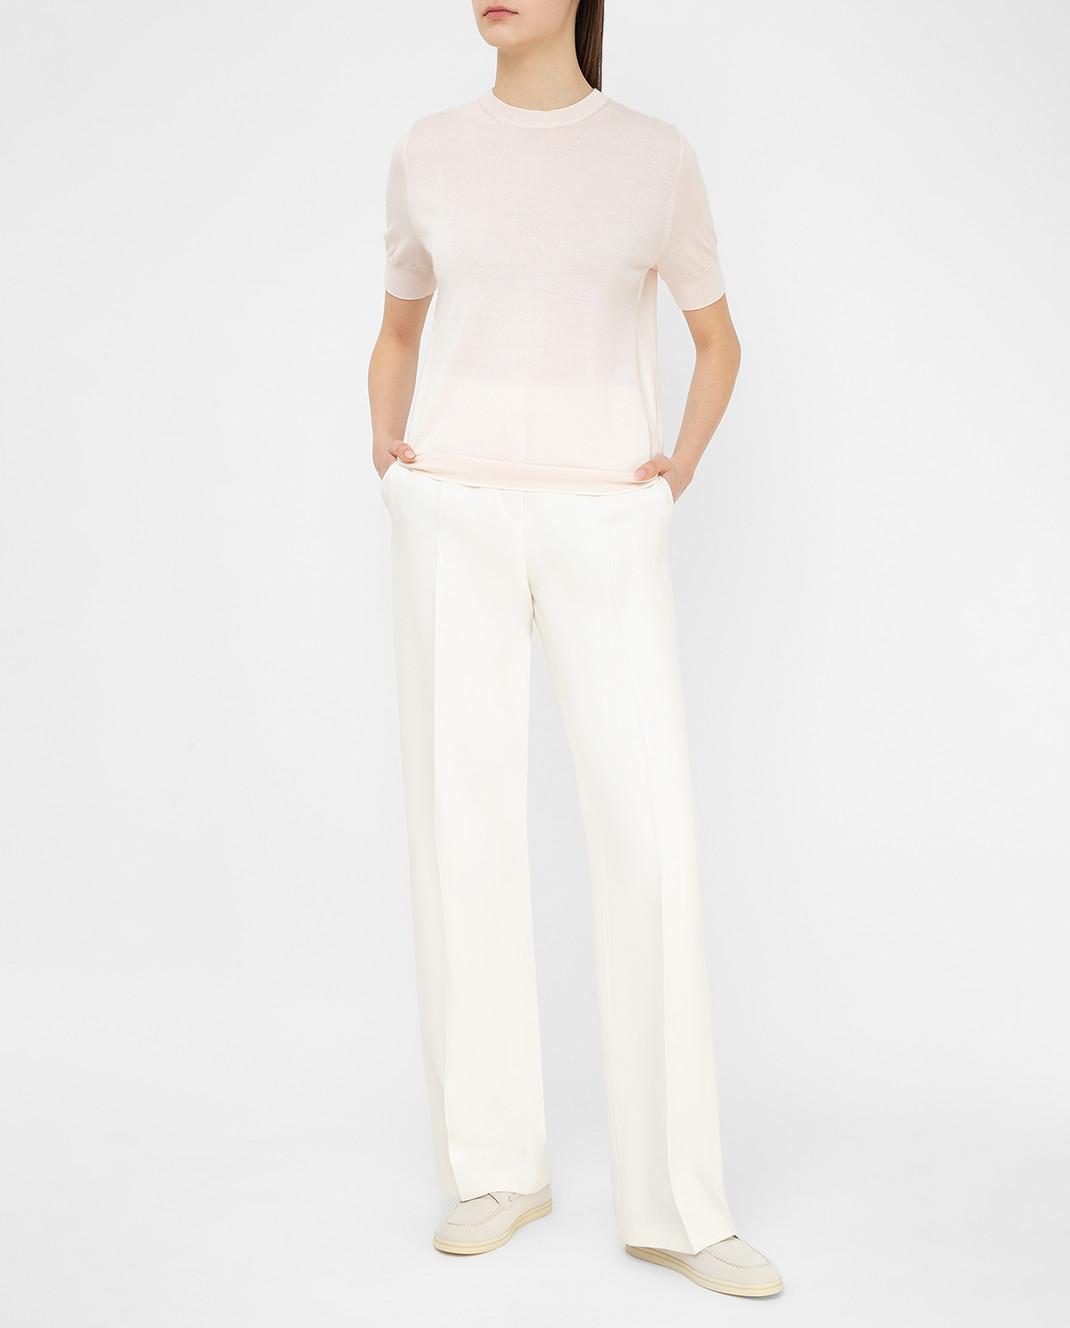 Loro Piana Светло-бежевые брюки из шелка и шерсти F1FAI5226 изображение 2